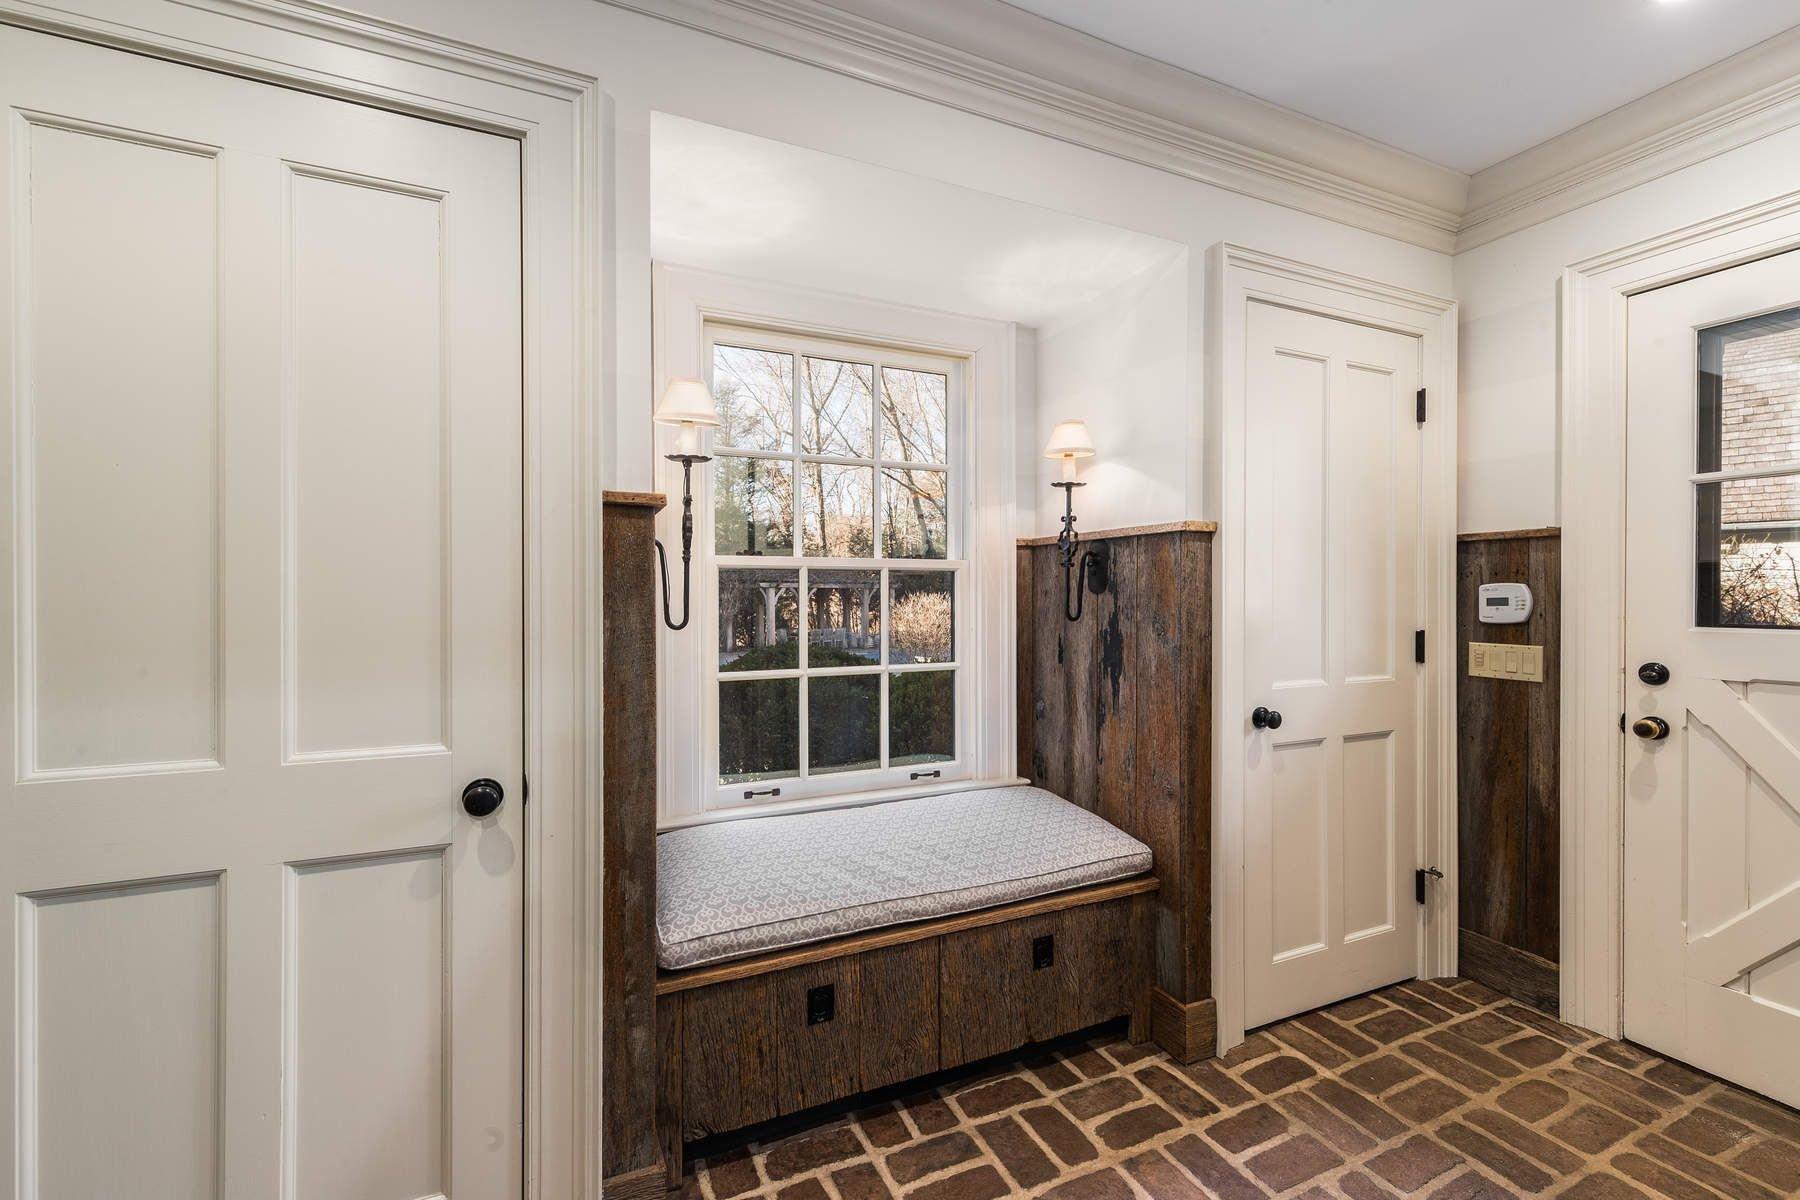 Window Seat Ideas How To Design A Beautiful Widow Seat